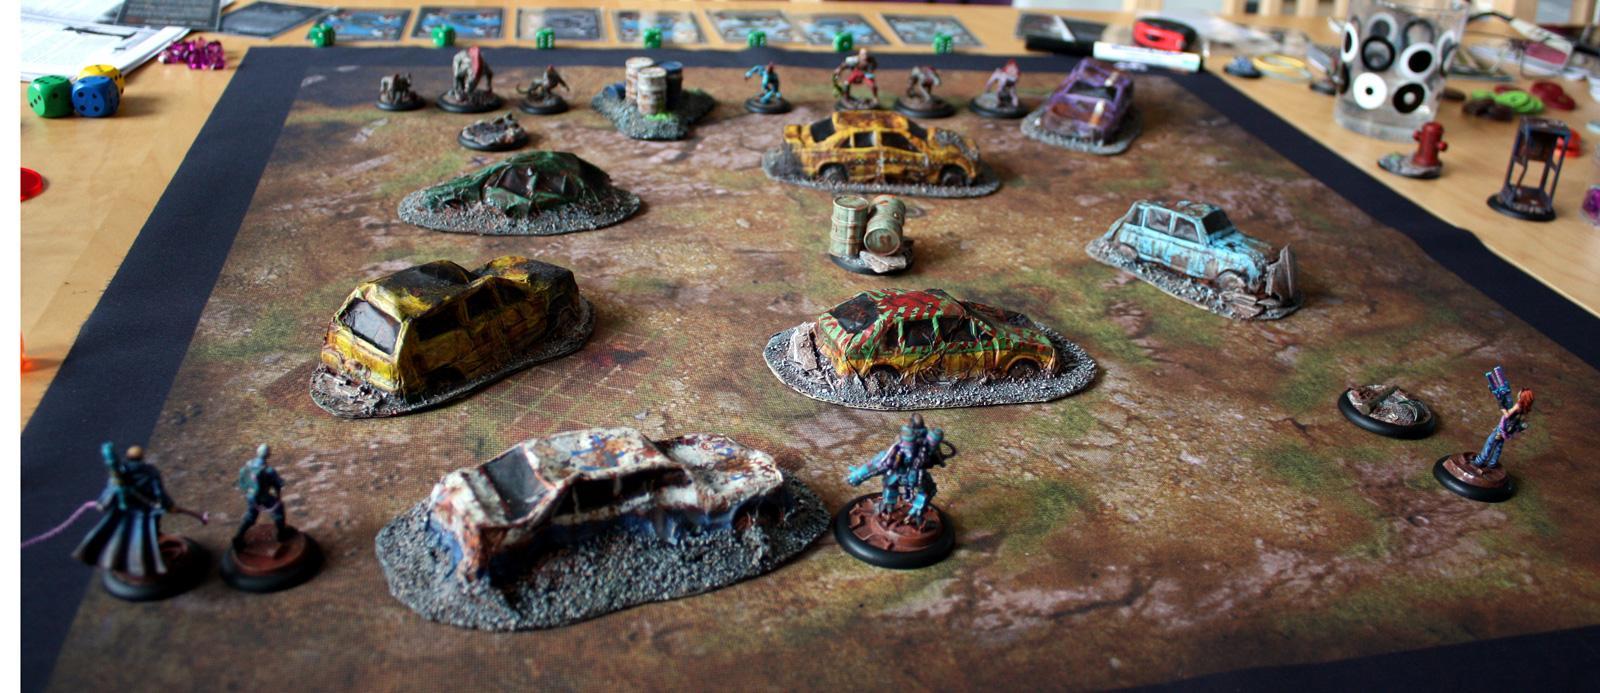 Apocalyptic, Askaris, Battleflags, Cars, Eden, Escape, Horde, Mutant, Pink, Post, Resistance, Skirmish, Turquoise, Wrecks